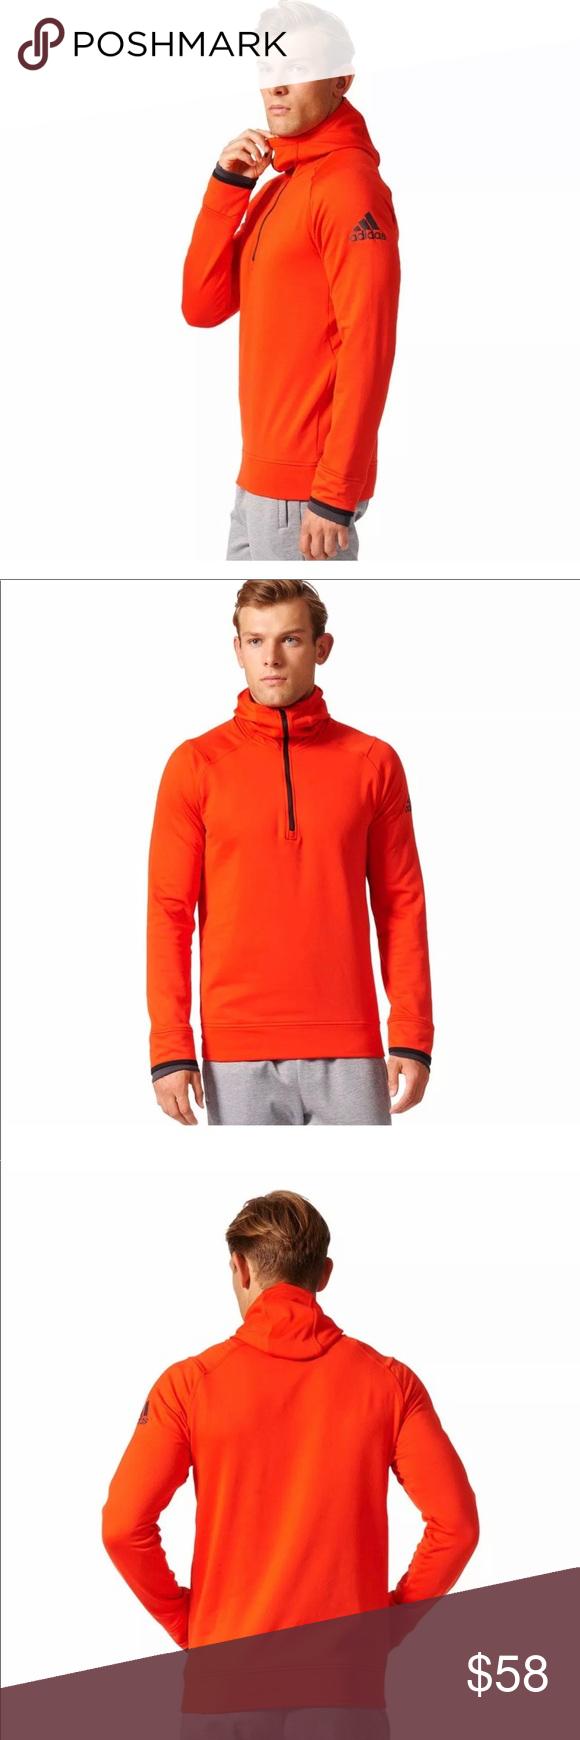 Adidas Clima Heat Hz Hoodie Adidas Men S Size L Climaheat Hz Hoodie 1 4 Zipper Pull Over Training Sweatshirt 93 Polyes Hoodies Sweatshirt Shirt Adidas Shirt [ 1740 x 580 Pixel ]